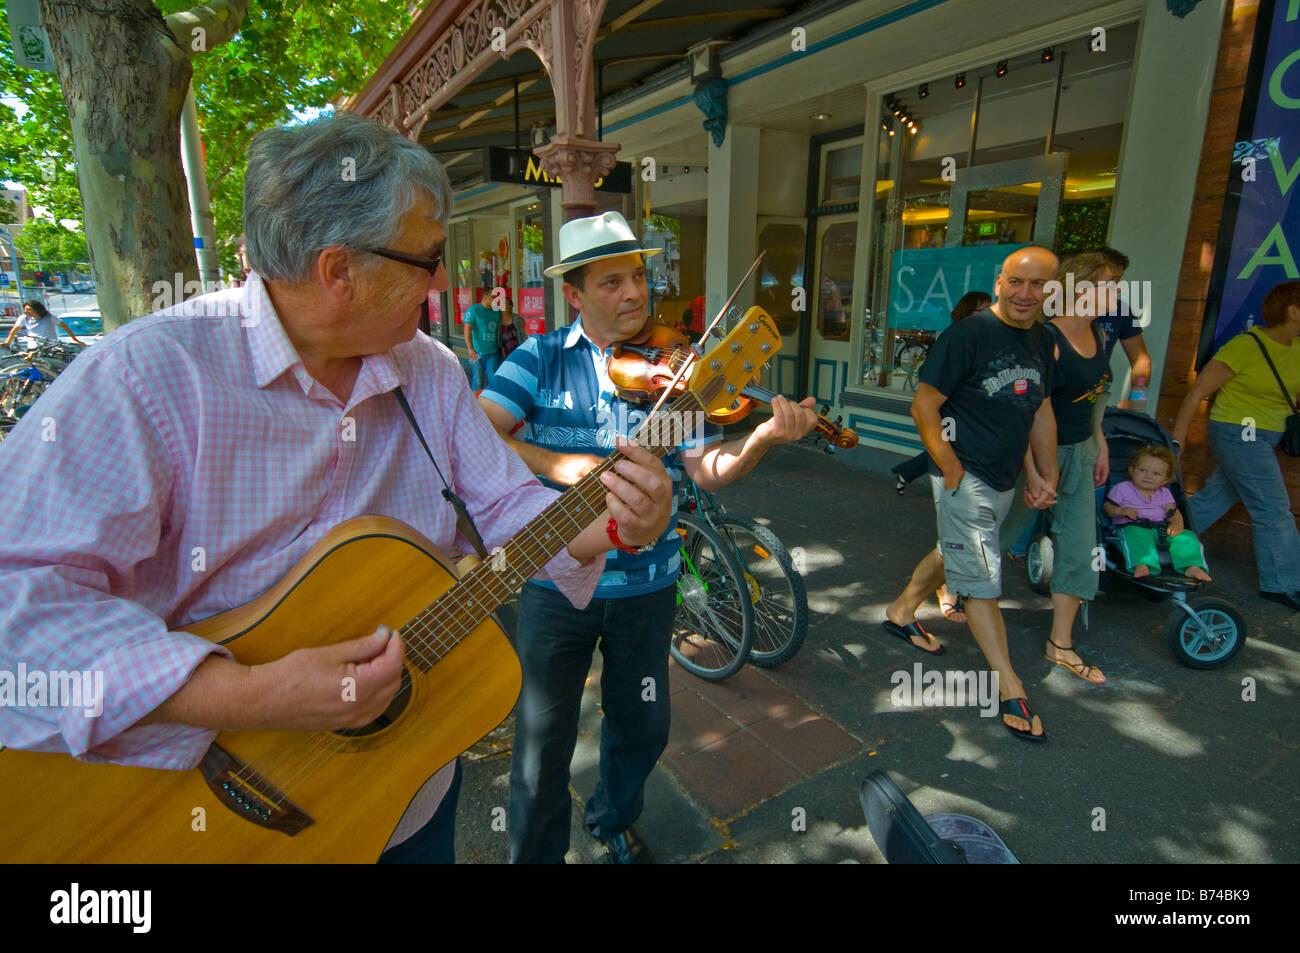 Buskers in Lygon Street Melbourne Australia - Stock Image